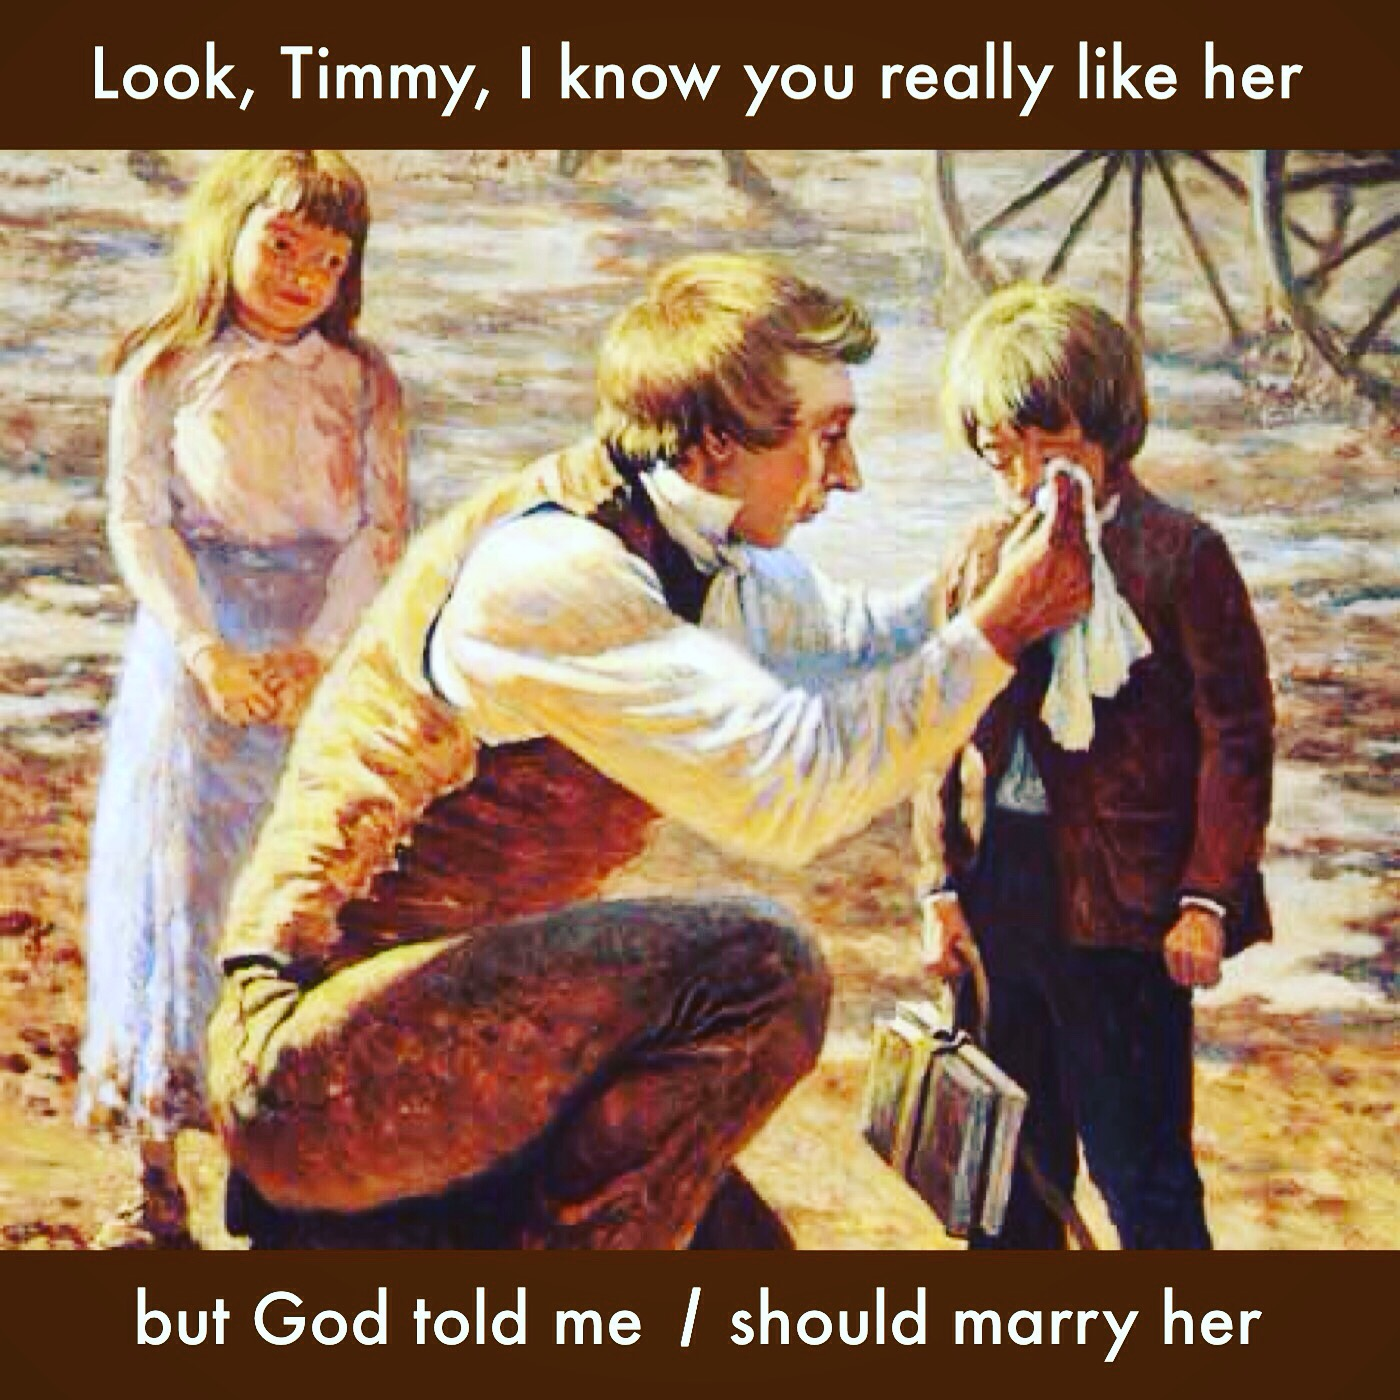 Joseph's child bride